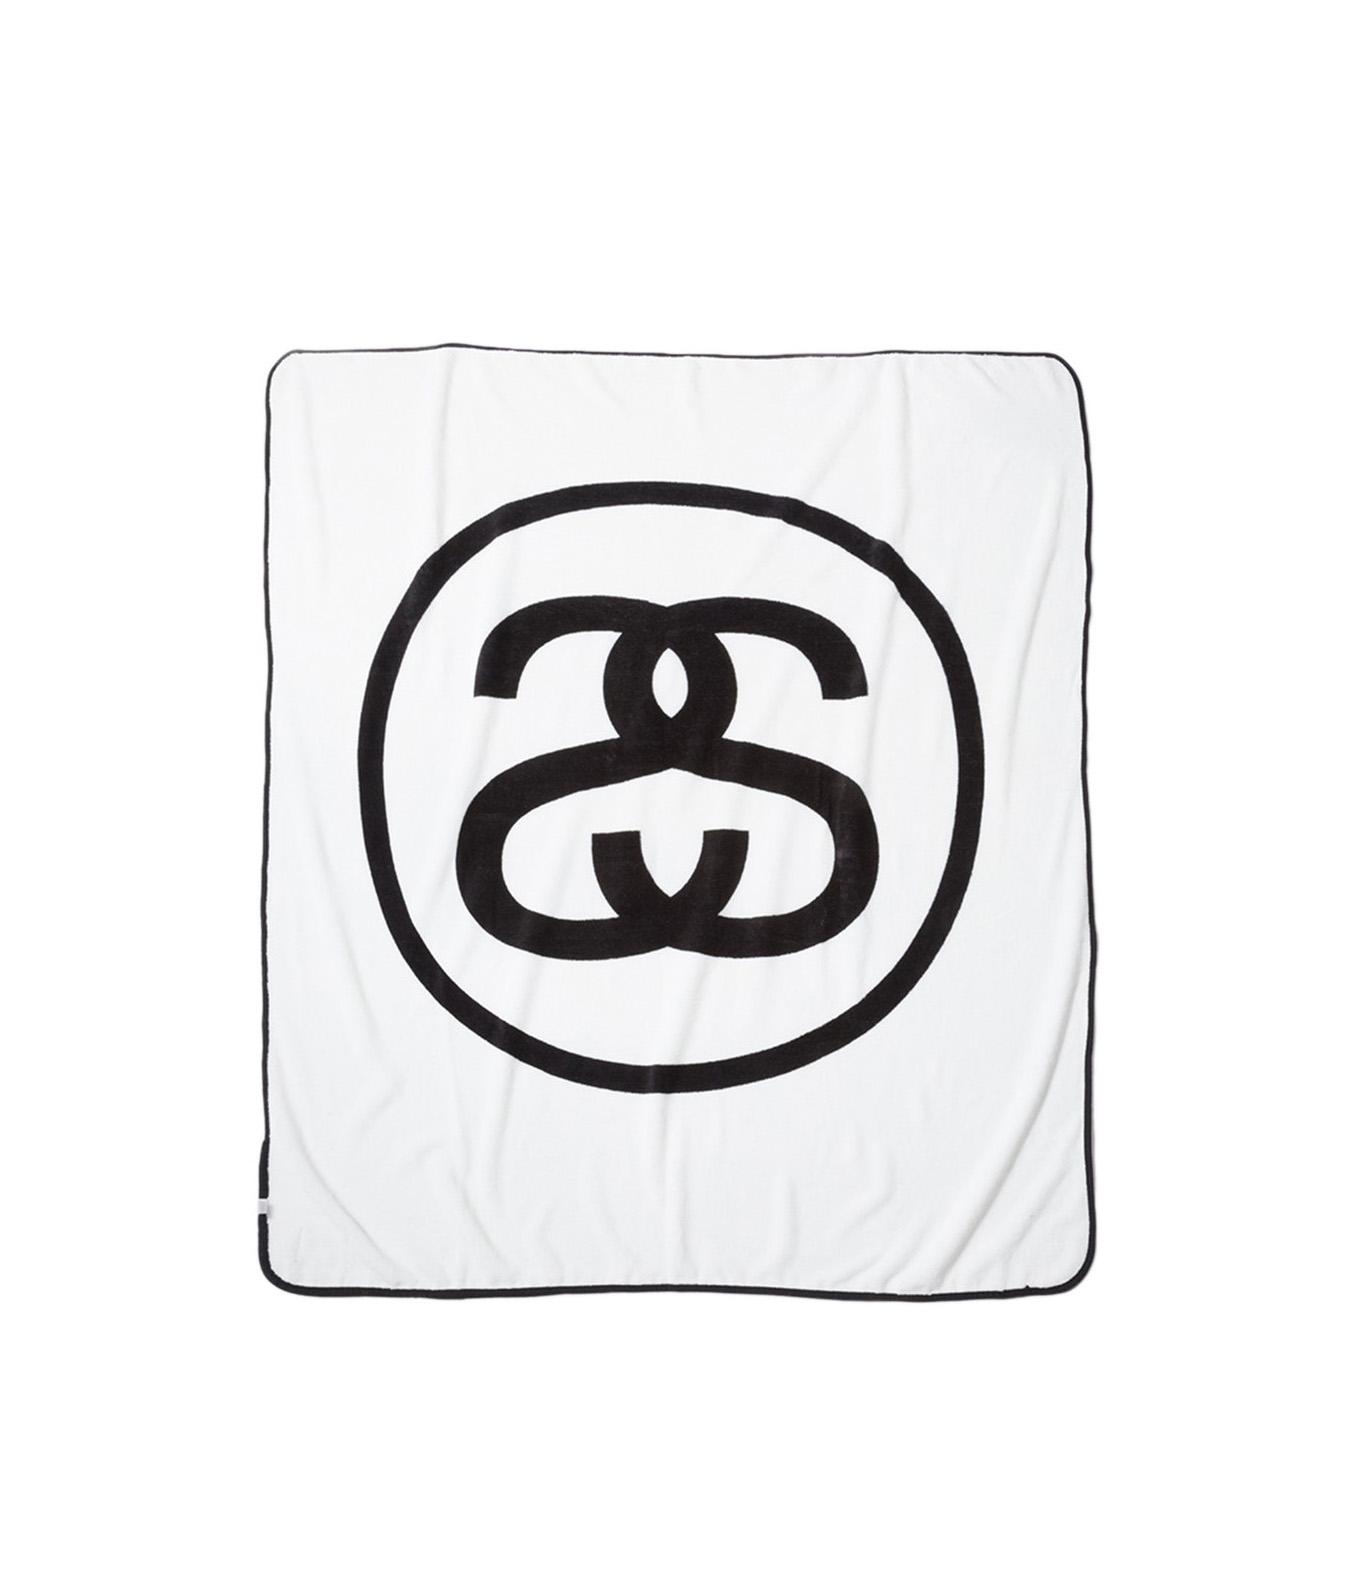 Shop Stussy Ss Link Fleece Blanket White At Itk Online Store